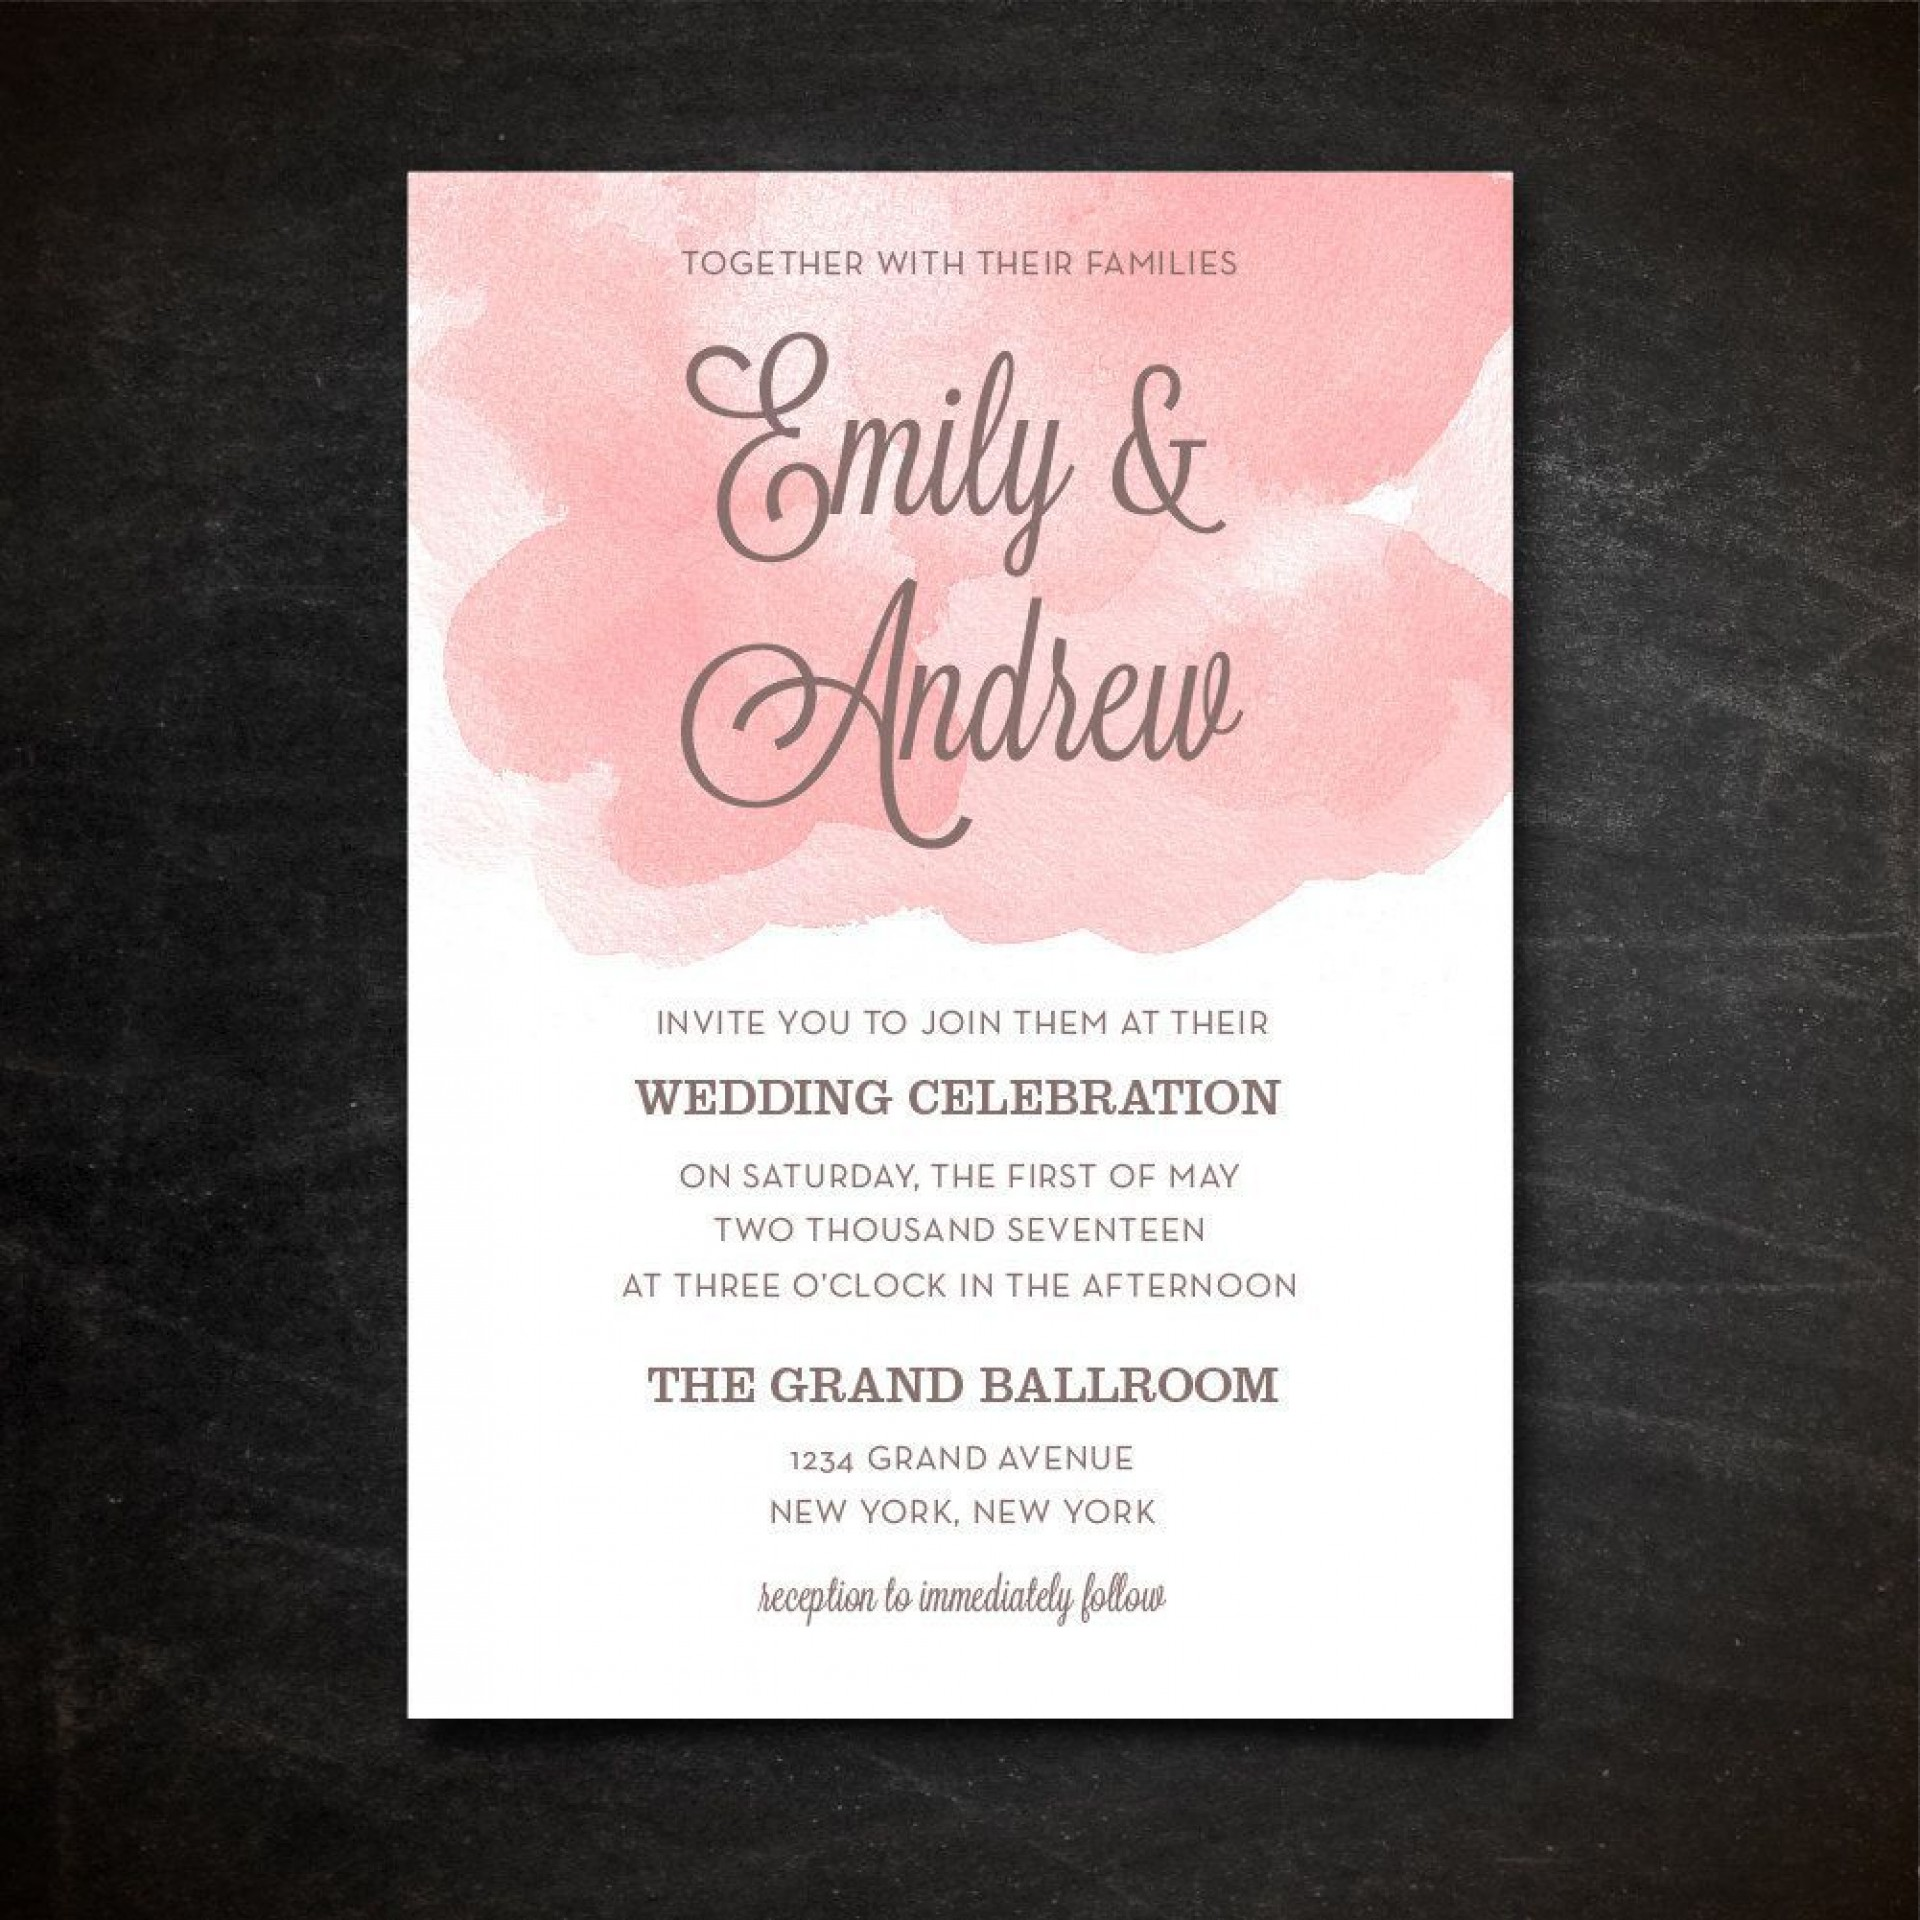 001 Unusual Photoshop Wedding Invitation Template Highest Clarity  Templates Hindu Psd Free Download Card1920